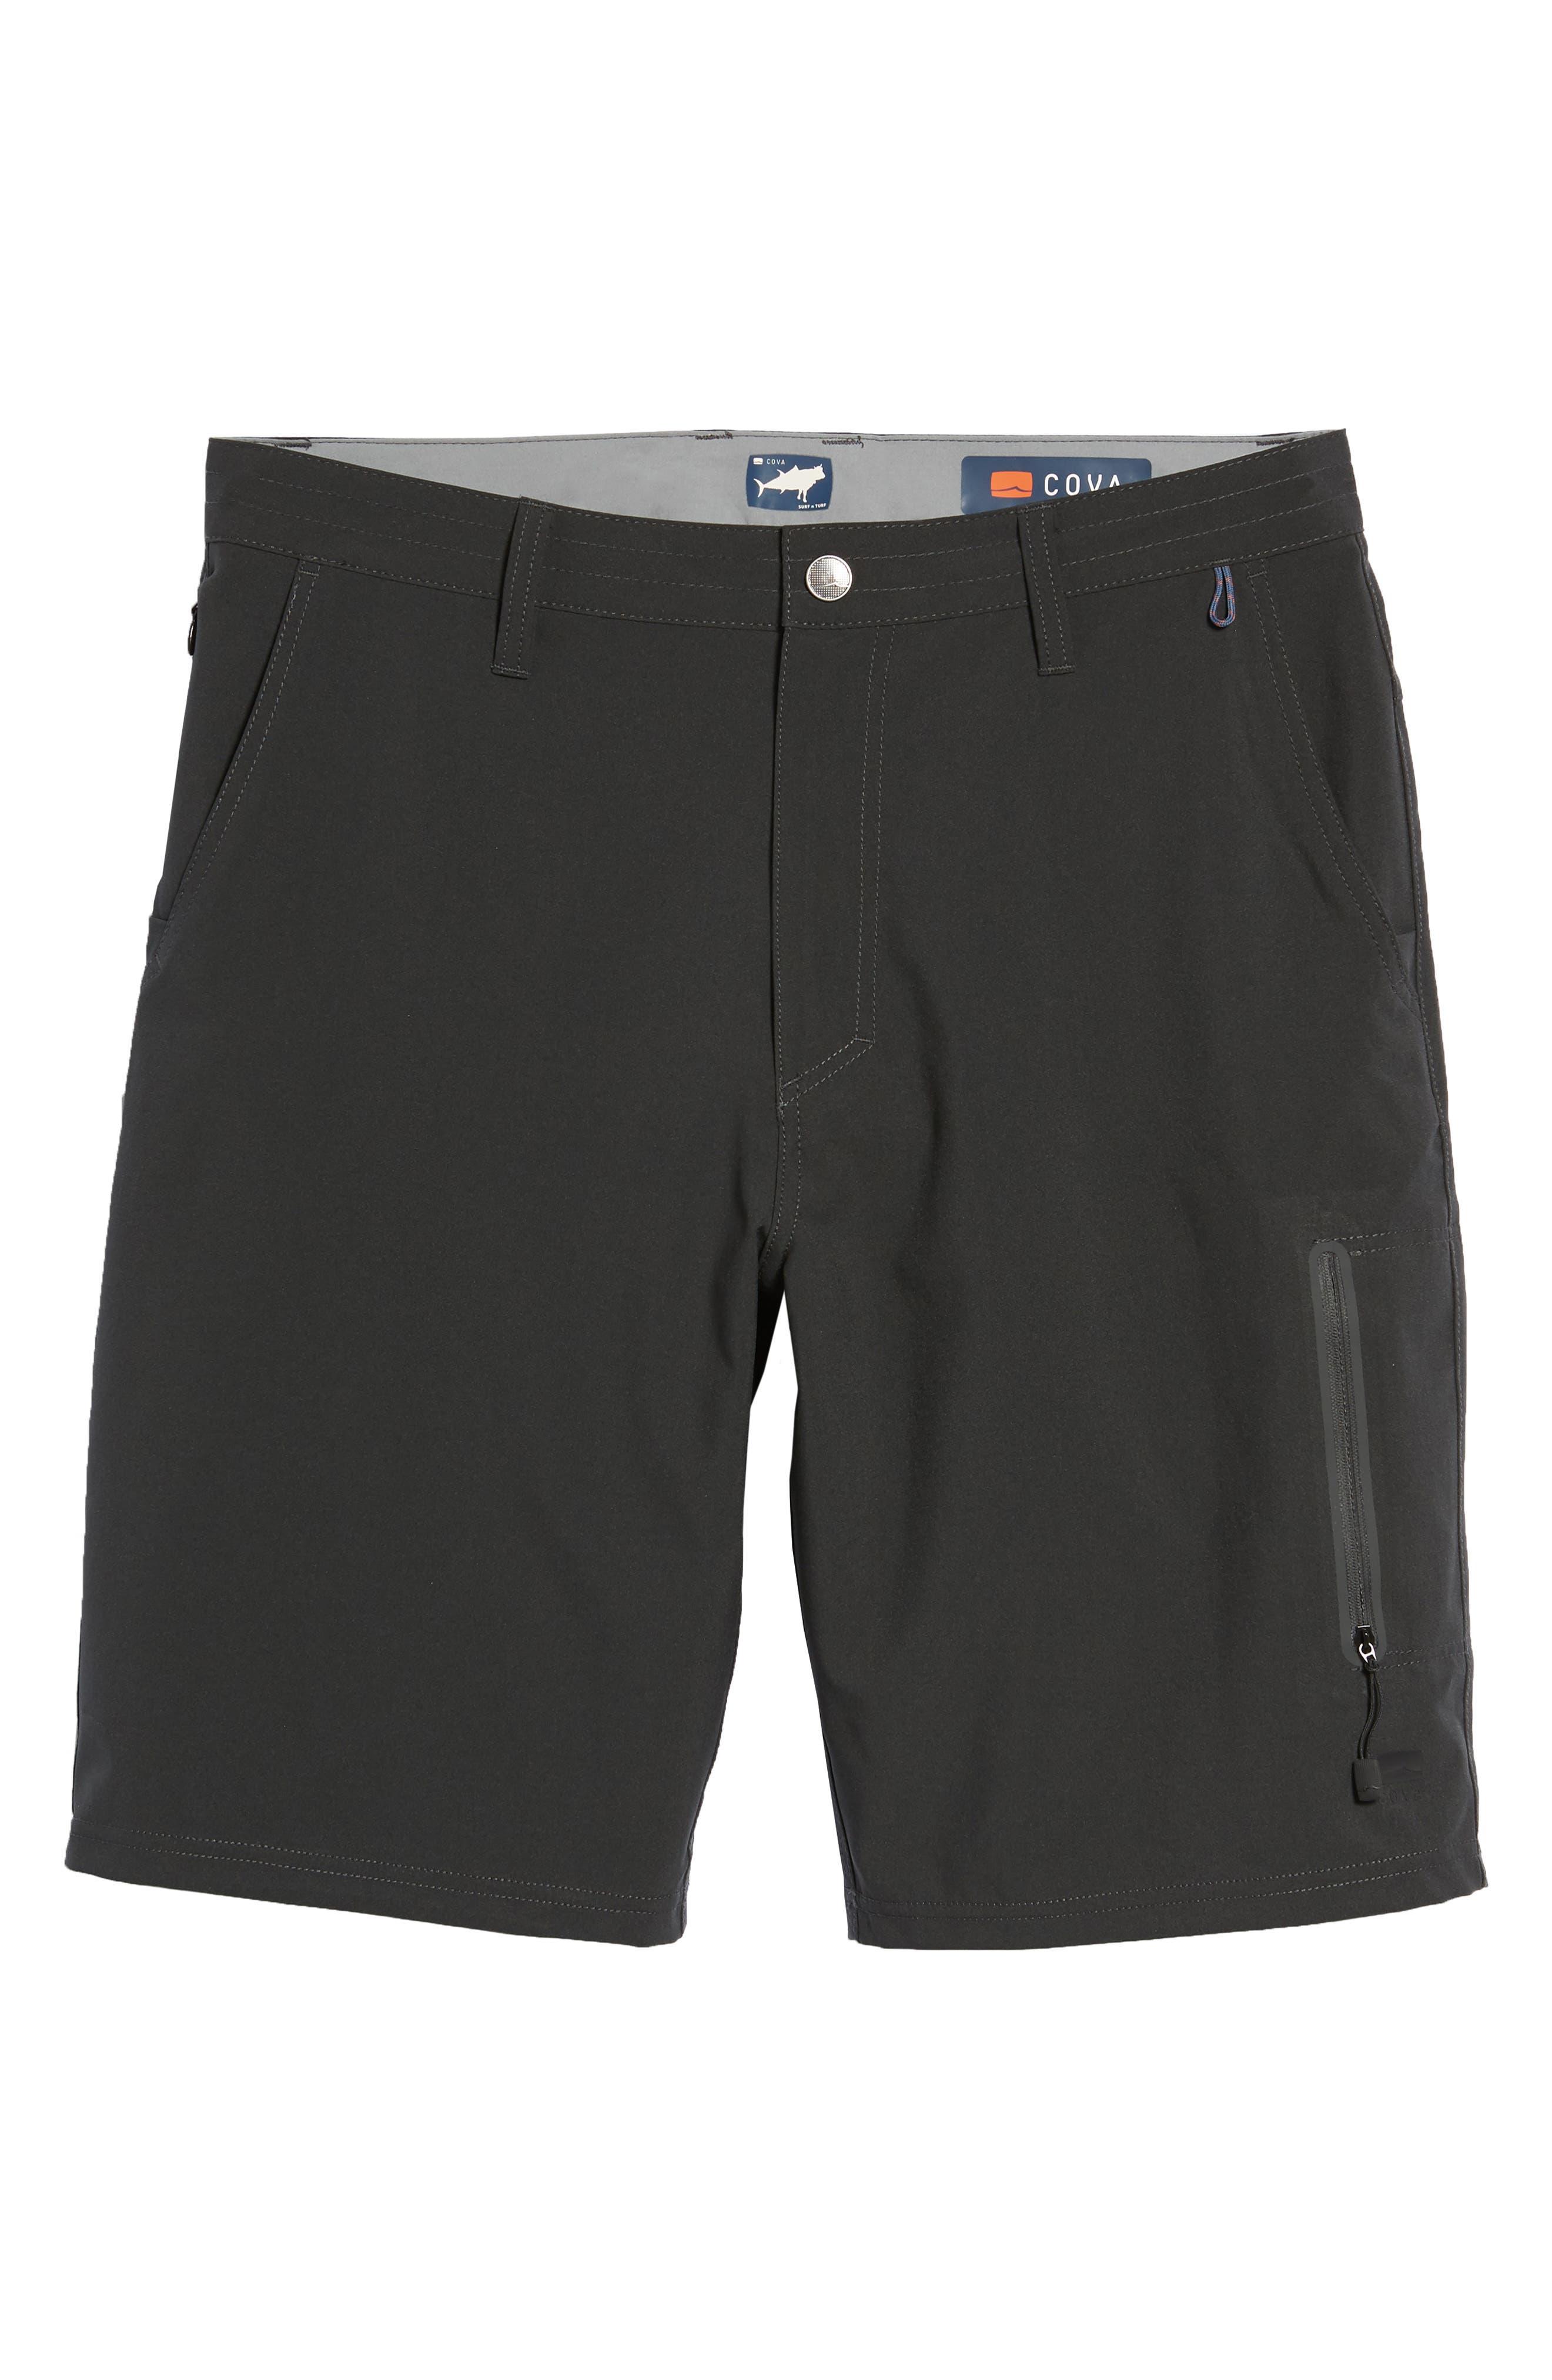 Pipeline Hybrid Shorts,                             Alternate thumbnail 6, color,                             Black